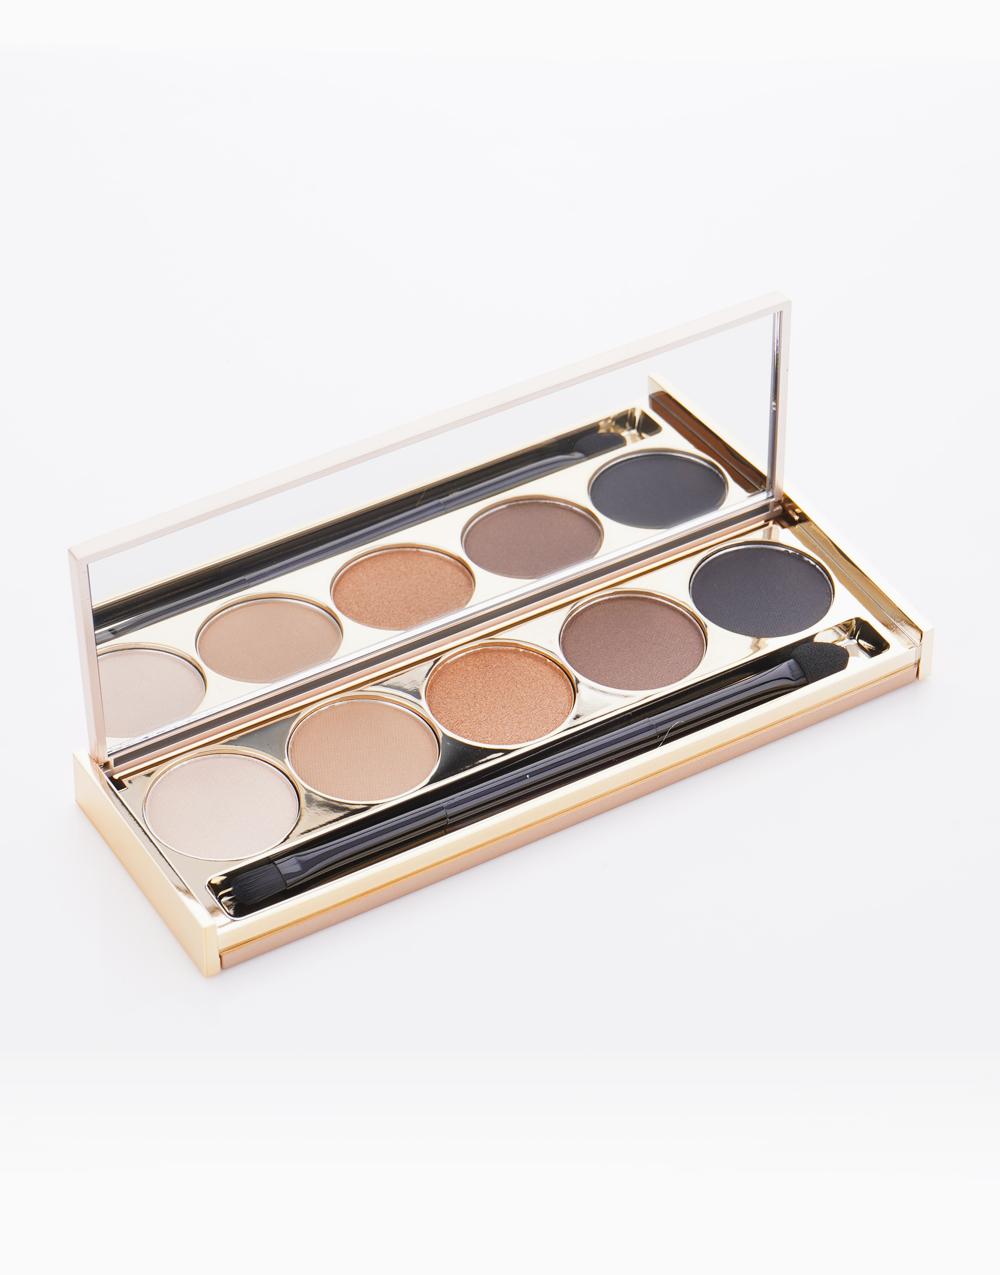 FS Filipiñana Eyeshadow Palette by FS Features & Shades | Sinisinta